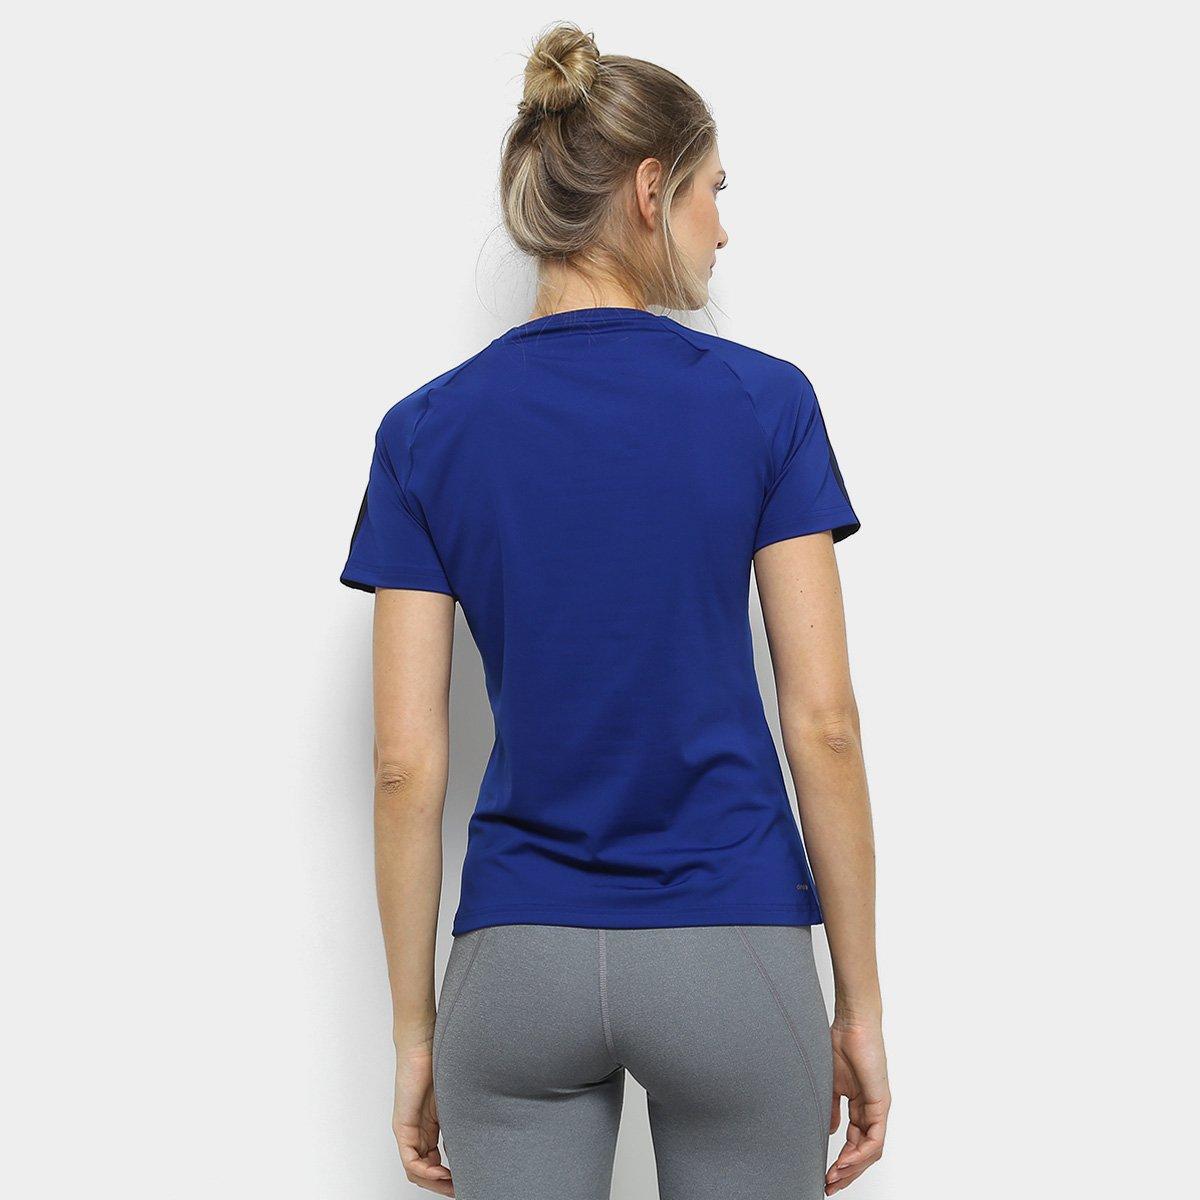 3Stripes 3Stripes D2M D2M Azul Adidas Camiseta Azul Feminina Camiseta Adidas Feminina IqxpwyA8O